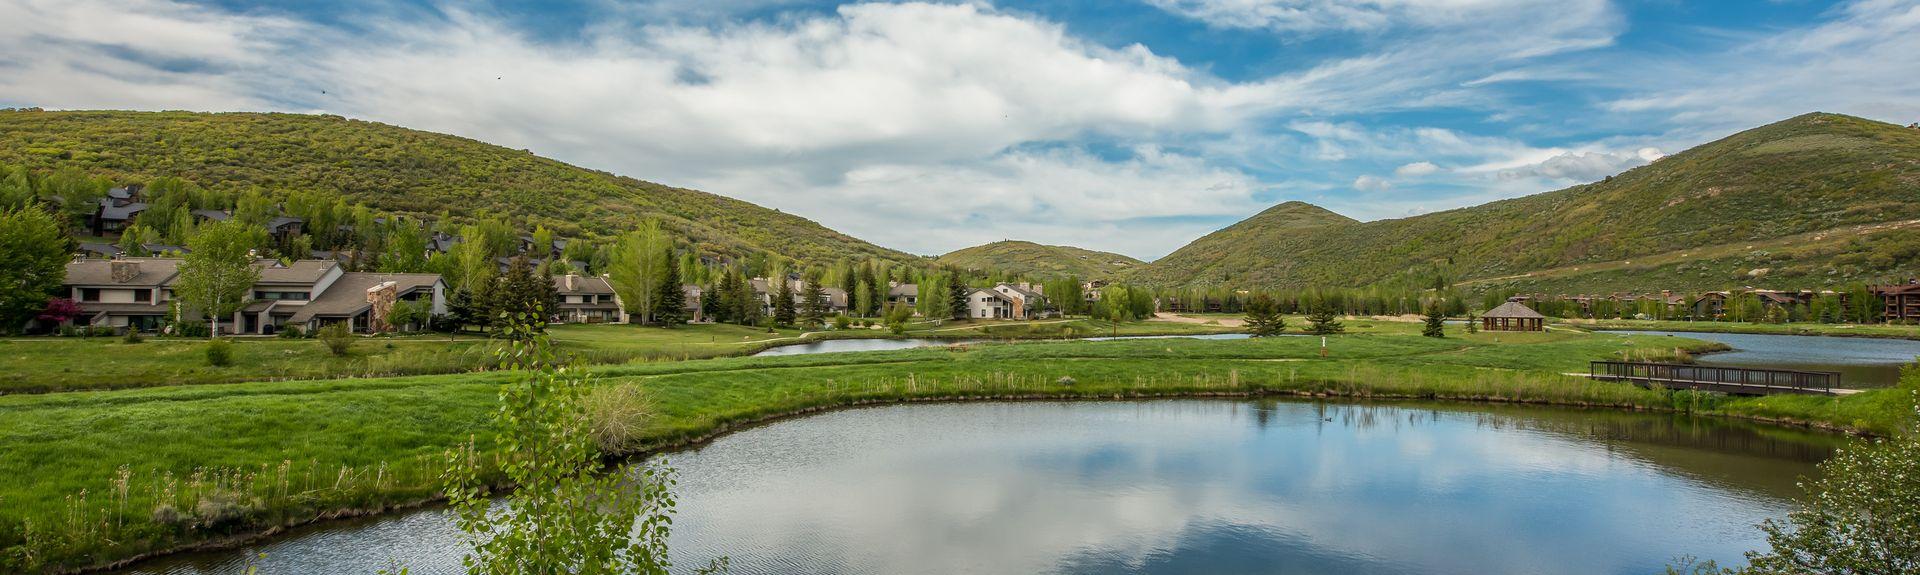 Deer Creek State Park, Heber City, Utah, Verenigde Staten